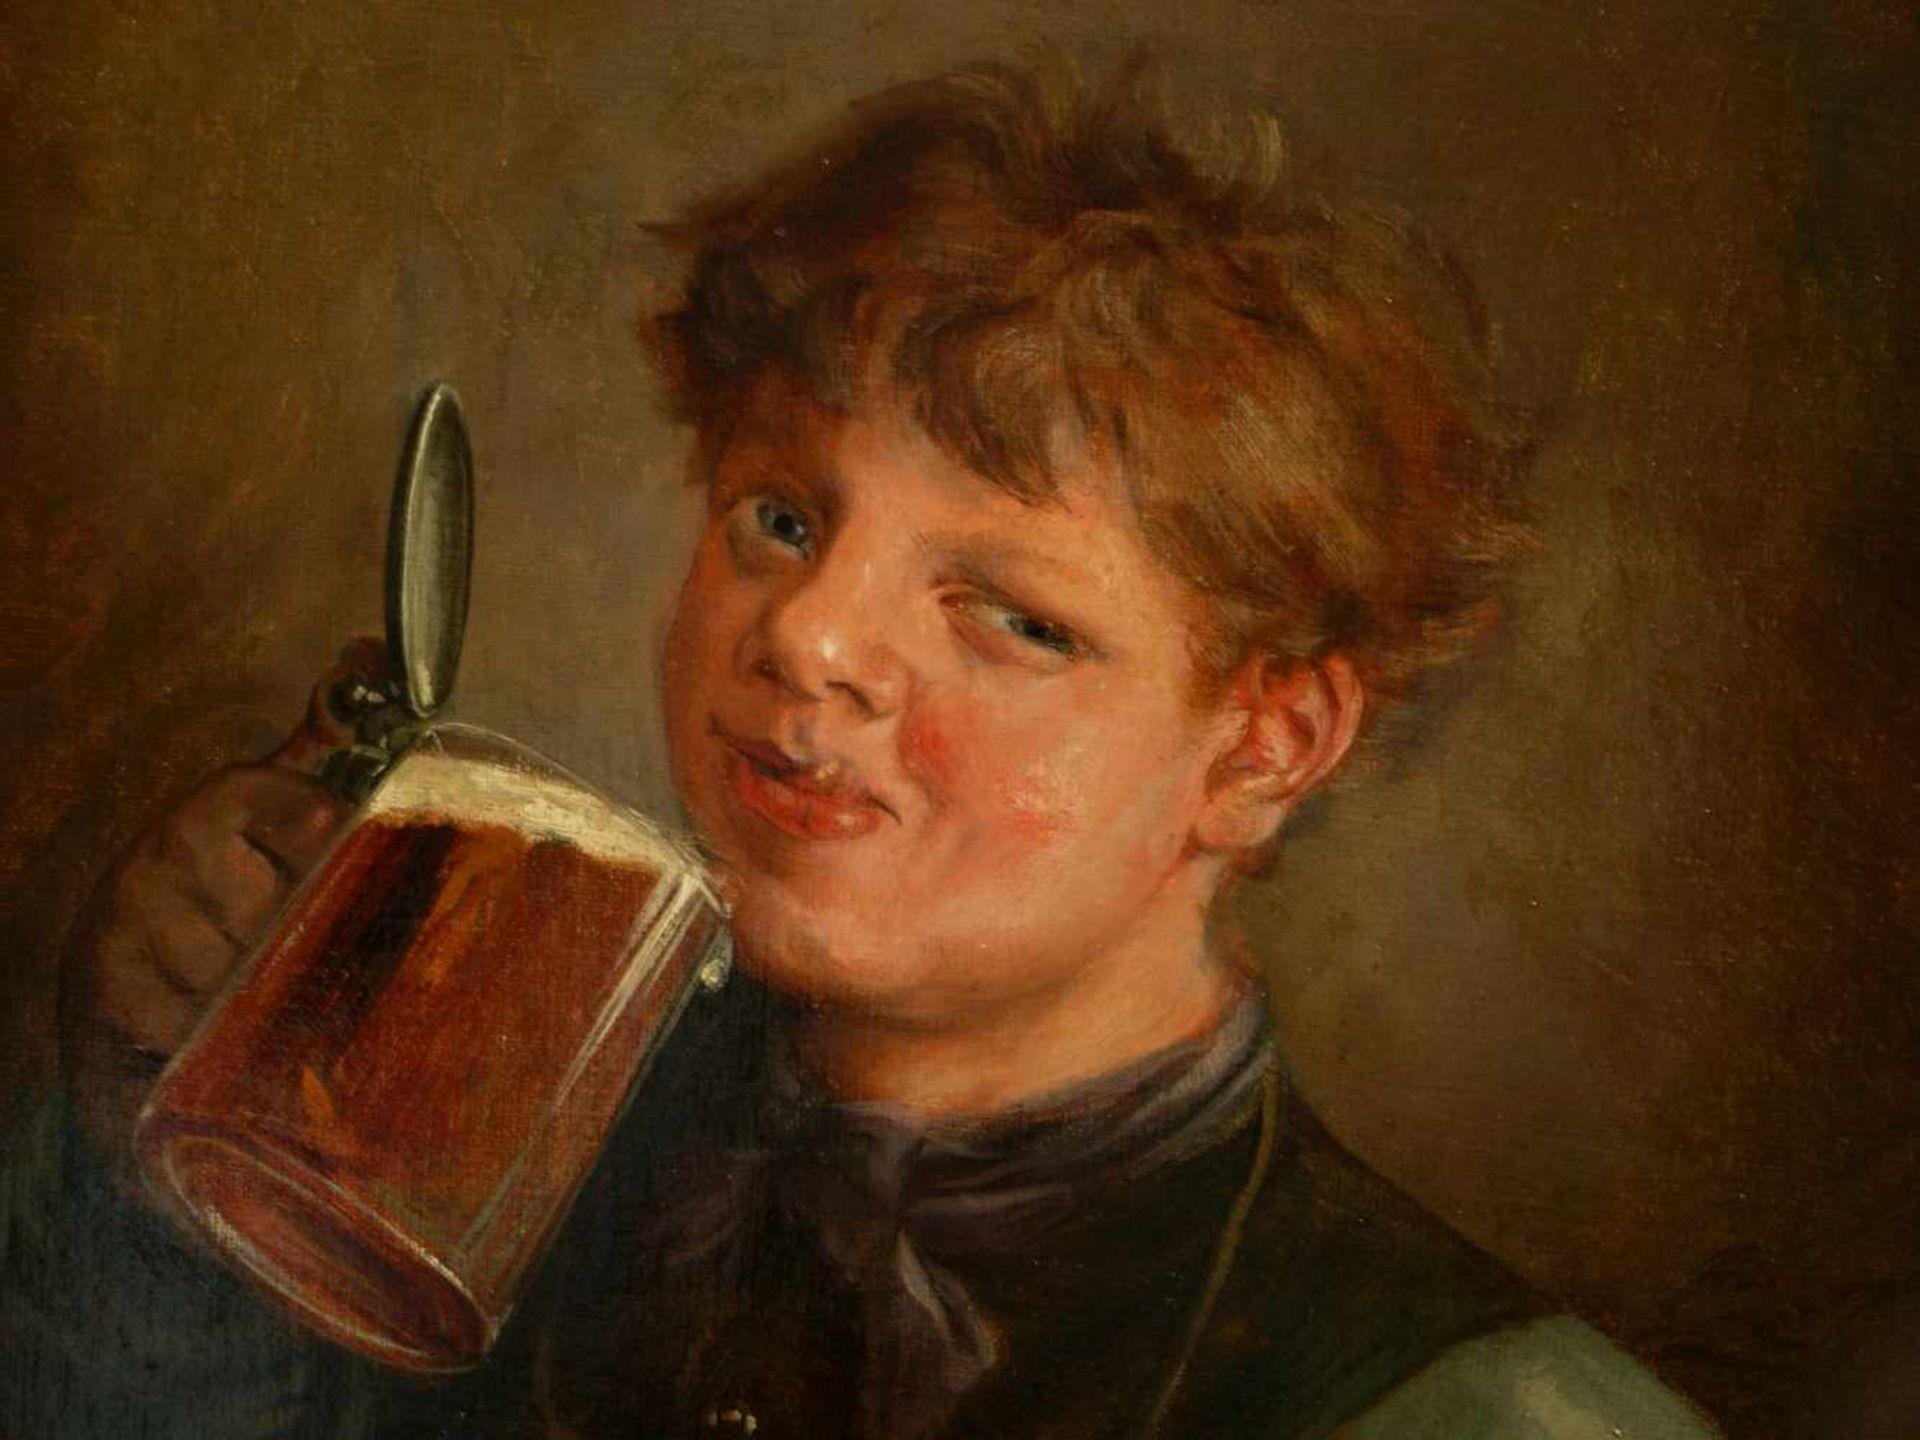 Lassen, Hans August (1857-1931) - Biertrinkender Jüngling Düsseldorf 1890Großformatiges Hüftstück, - Bild 4 aus 6